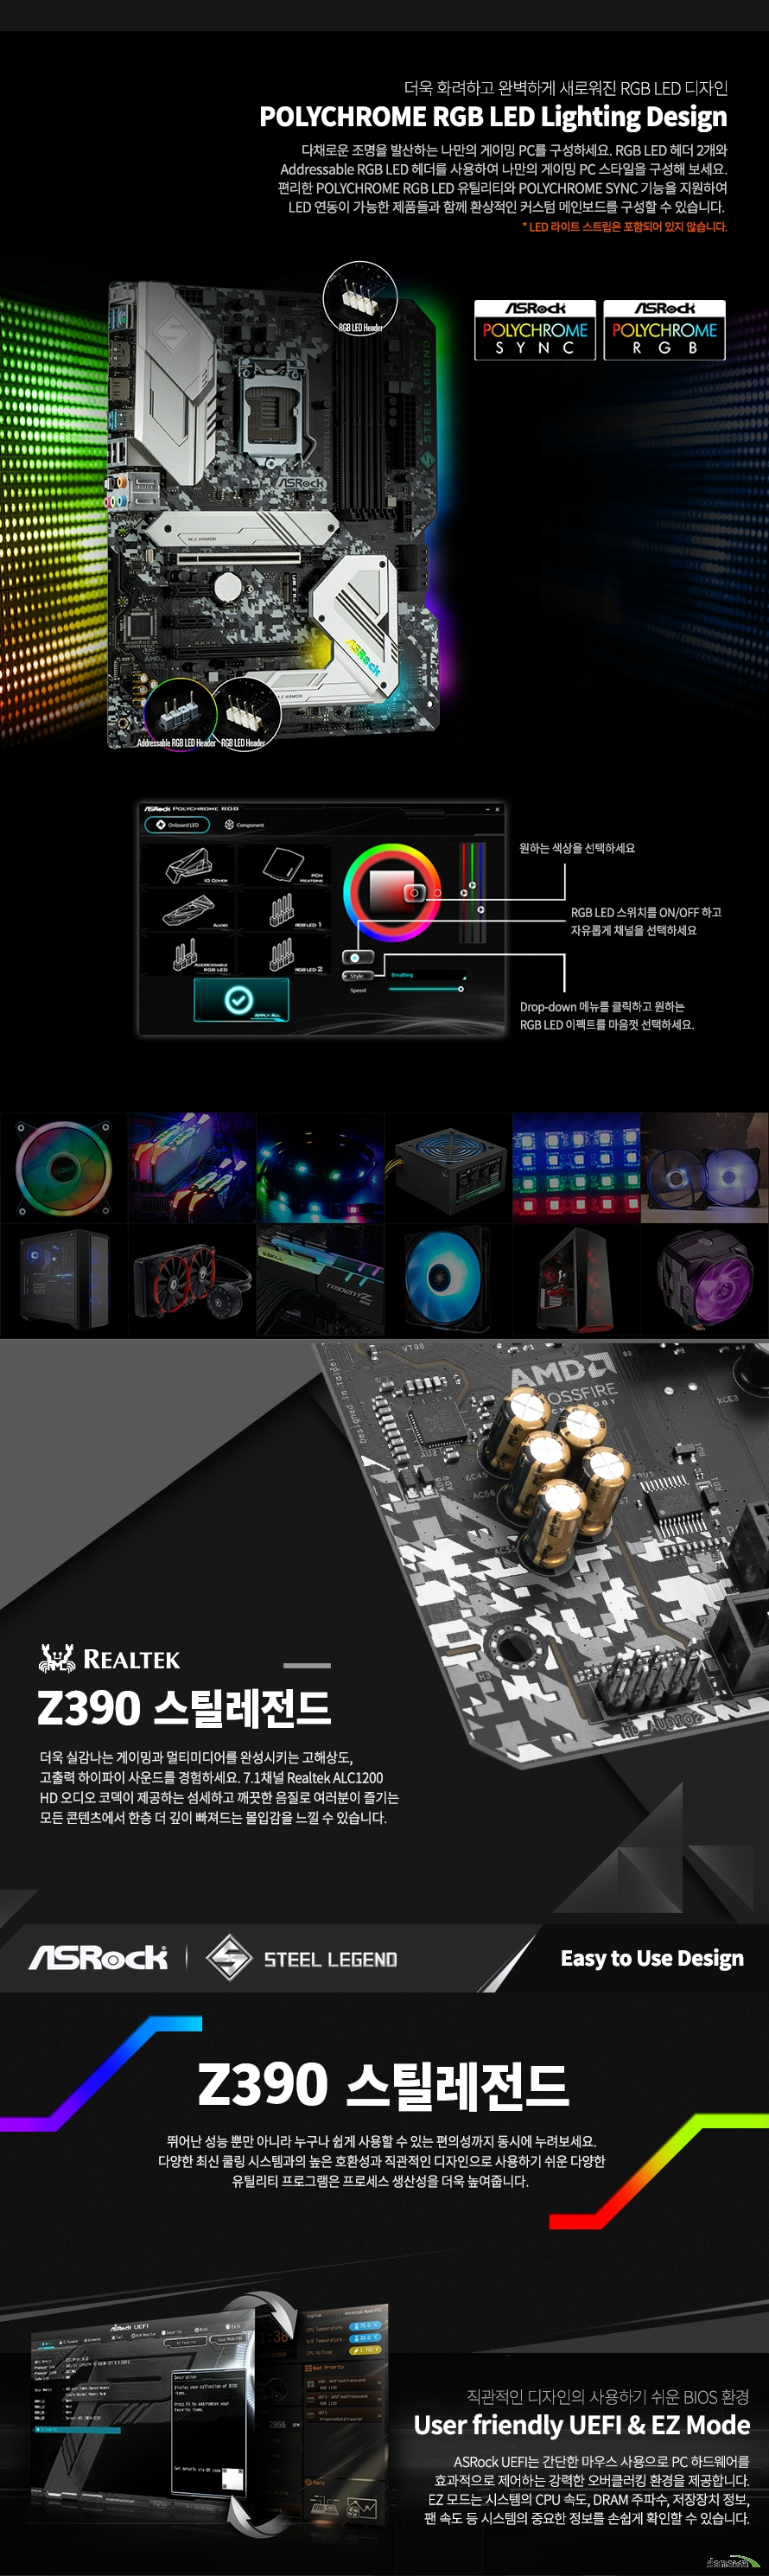 ASRock  Z390 스틸레전드 디앤디컴